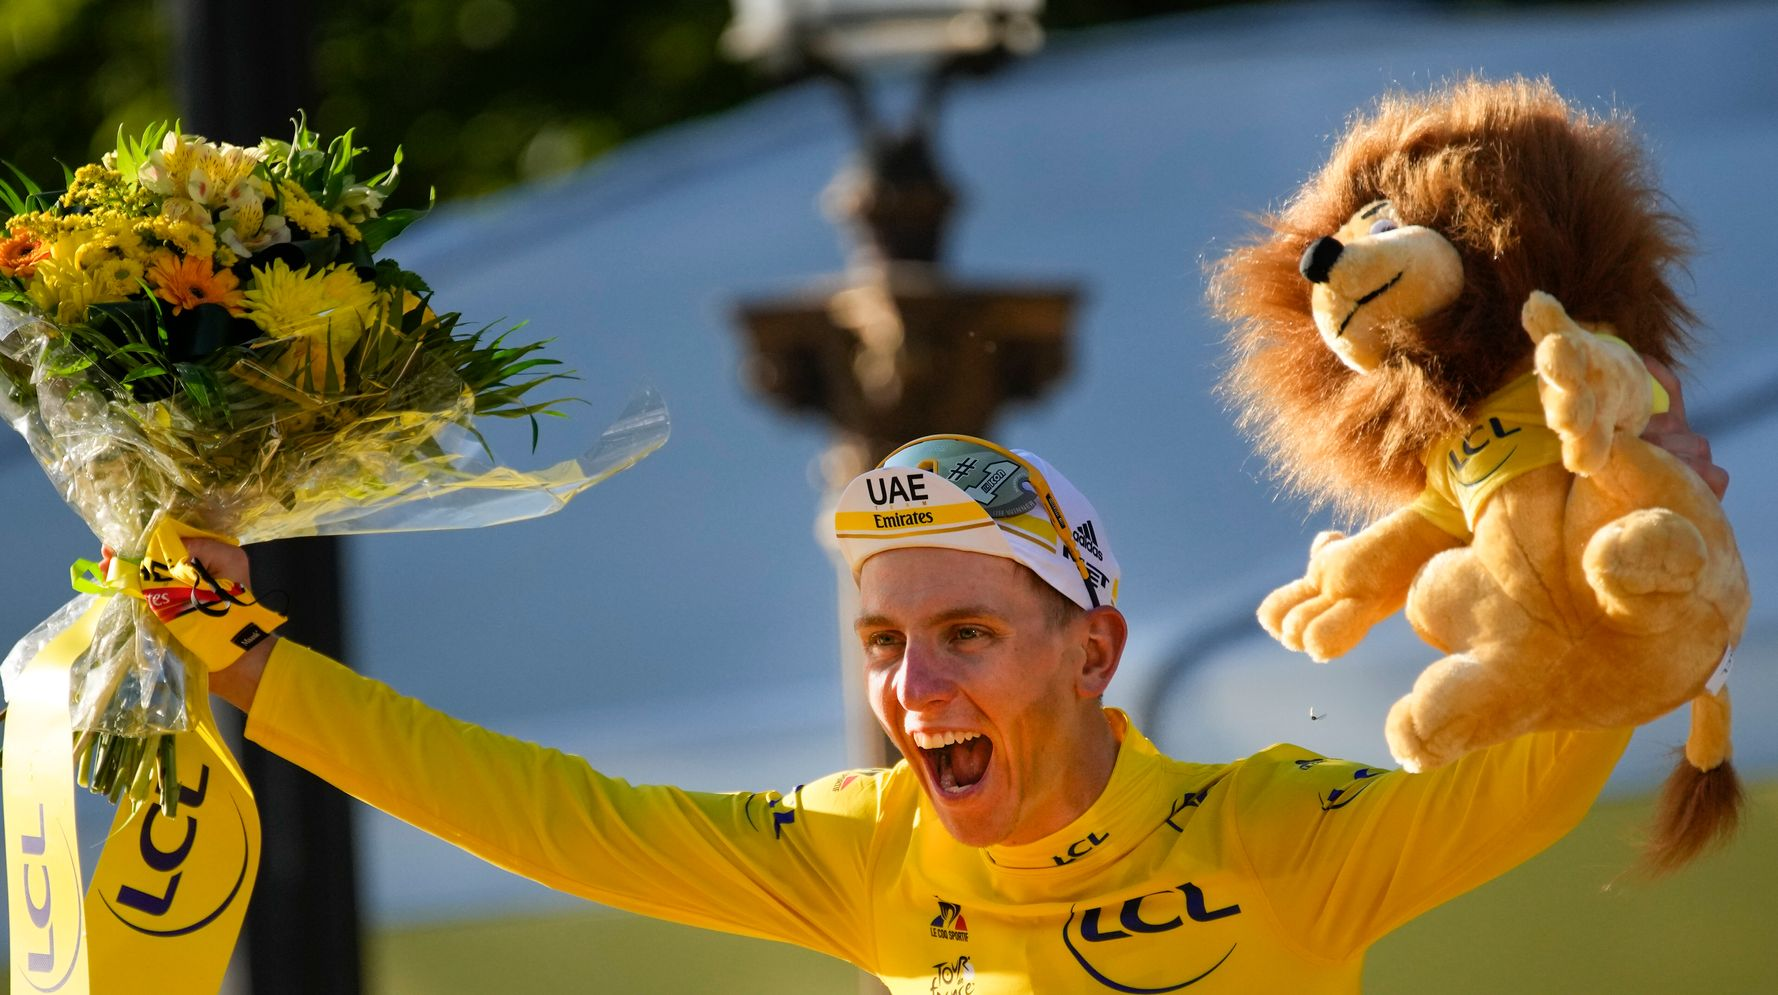 Cyclist Tadej Pogacar Wins 2nd Straight Tour De France Title